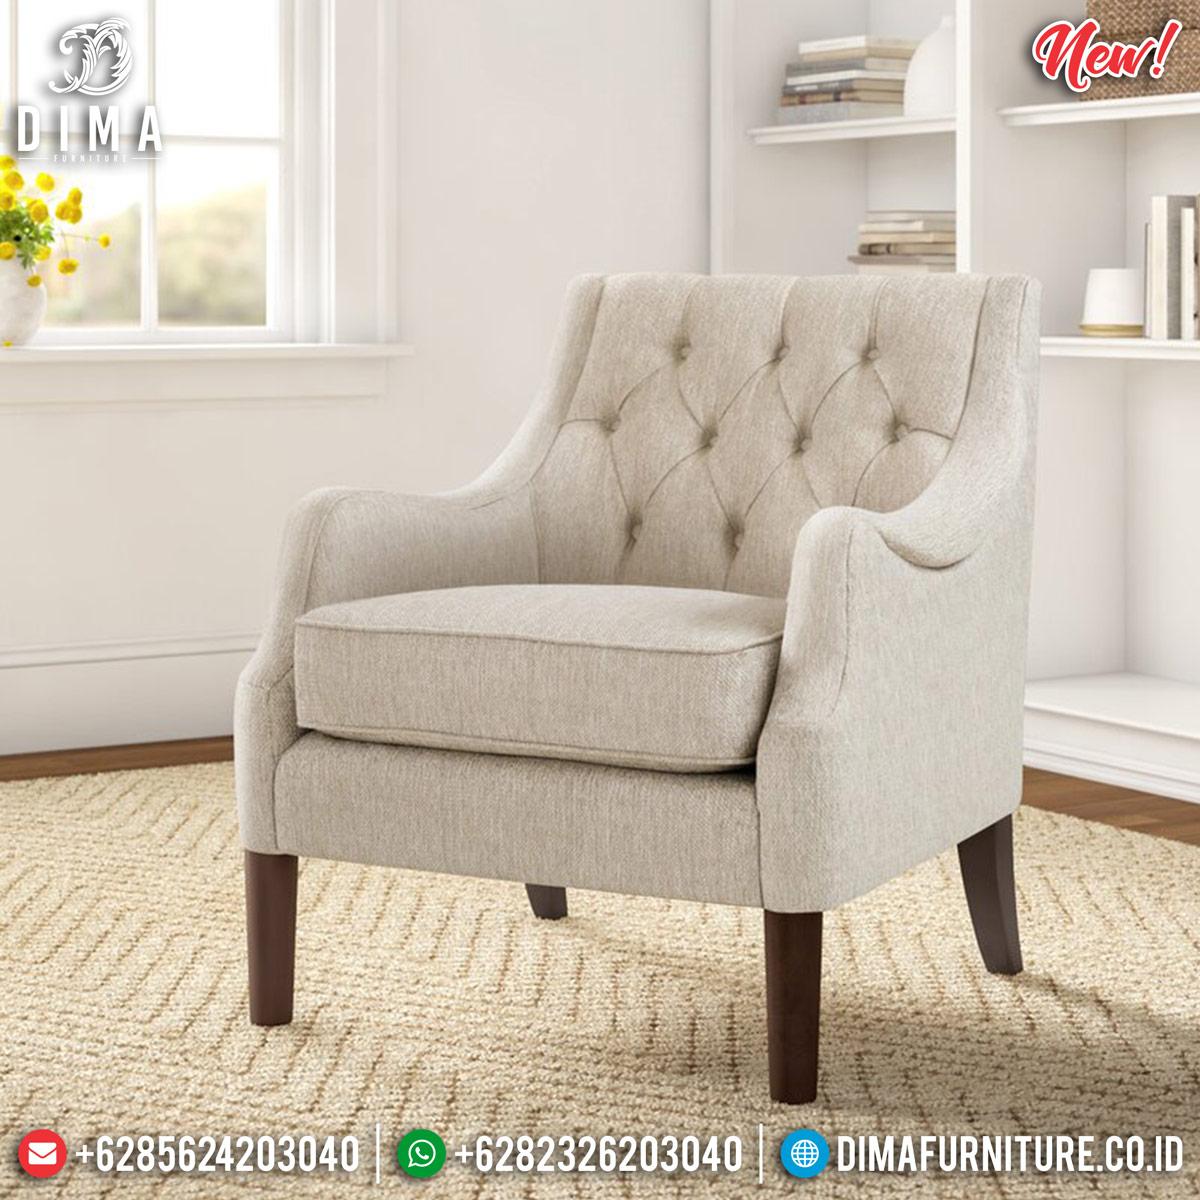 Epic Desain Sofa Minimalis Single Seater New Luxury Furniture Jepara MMJ-0818 Desain 1